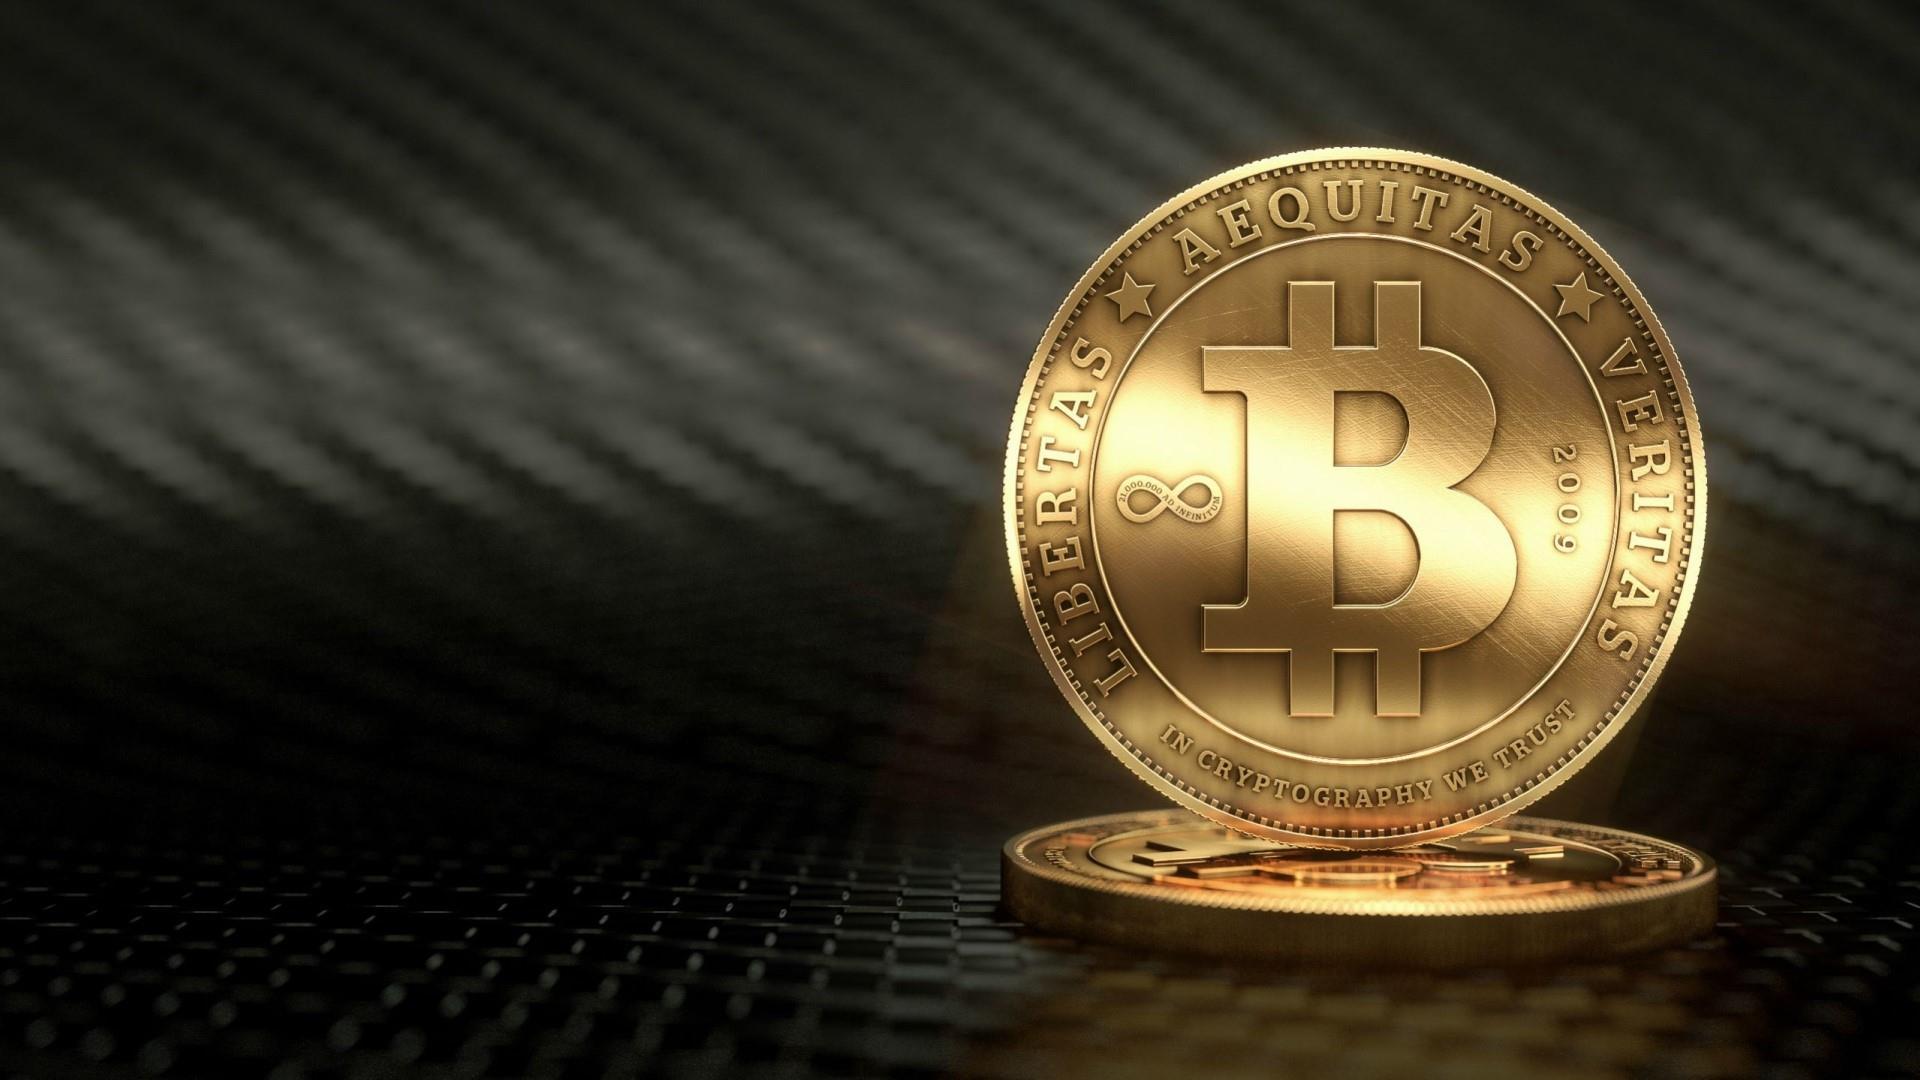 bitcoin desktop wallpaper 62340